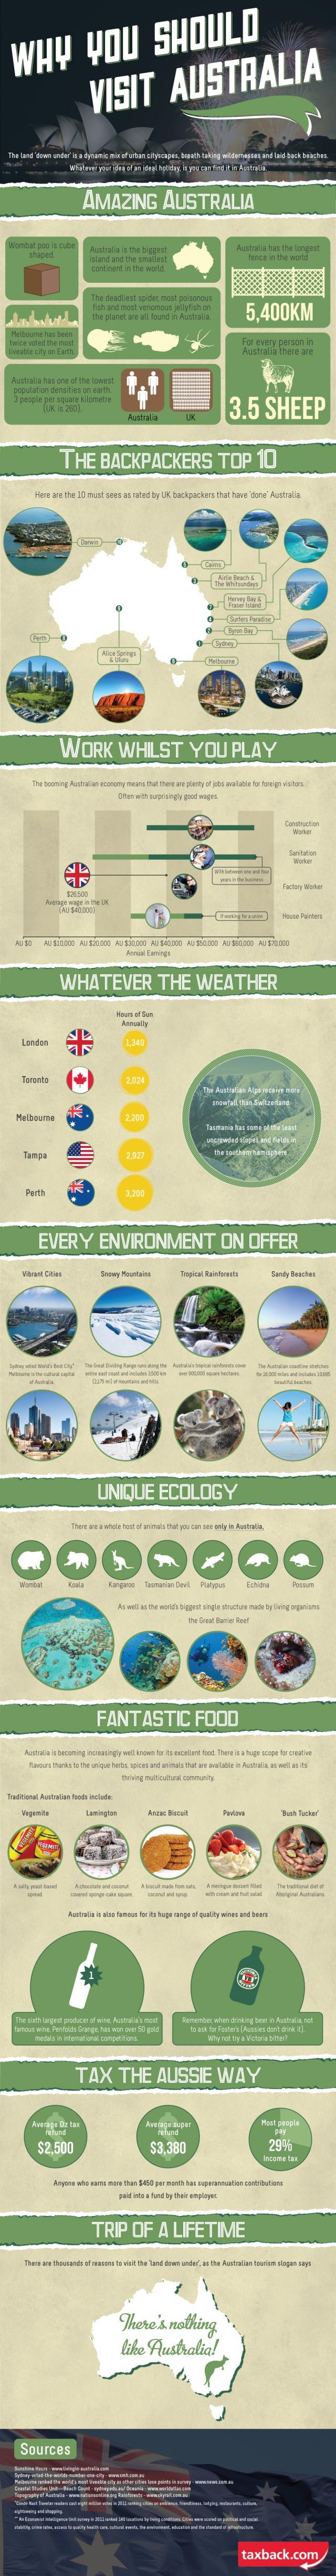 Por qué viajar hasta Australia